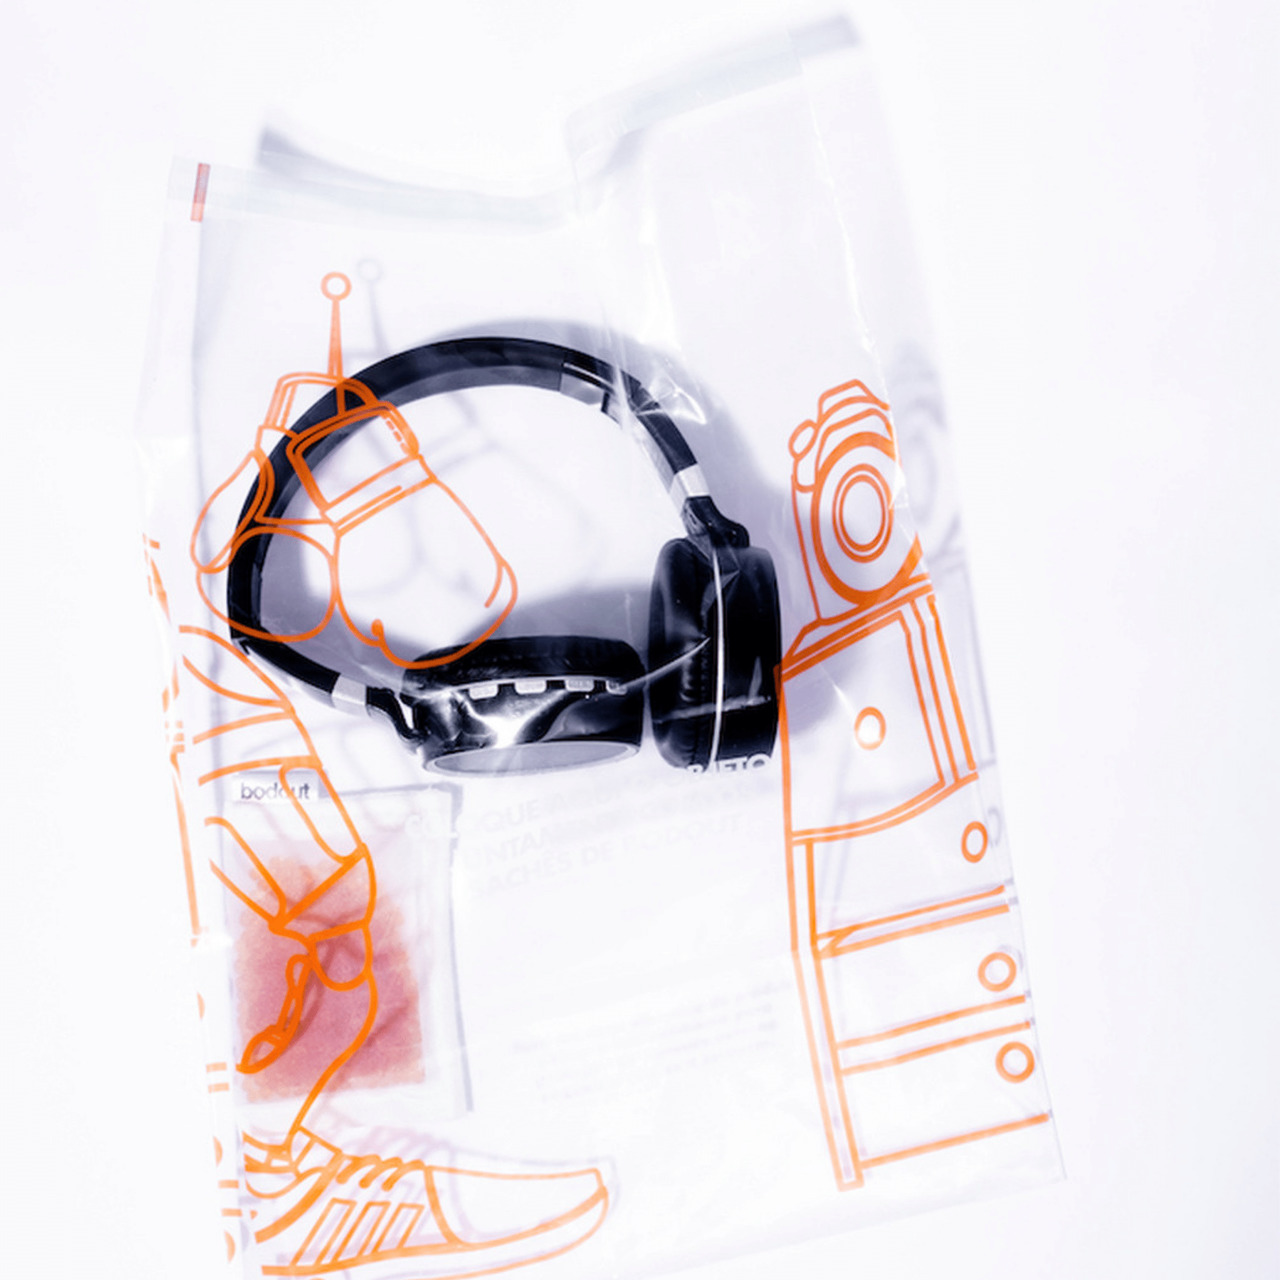 Sílica gel bodout - Eletrônicos